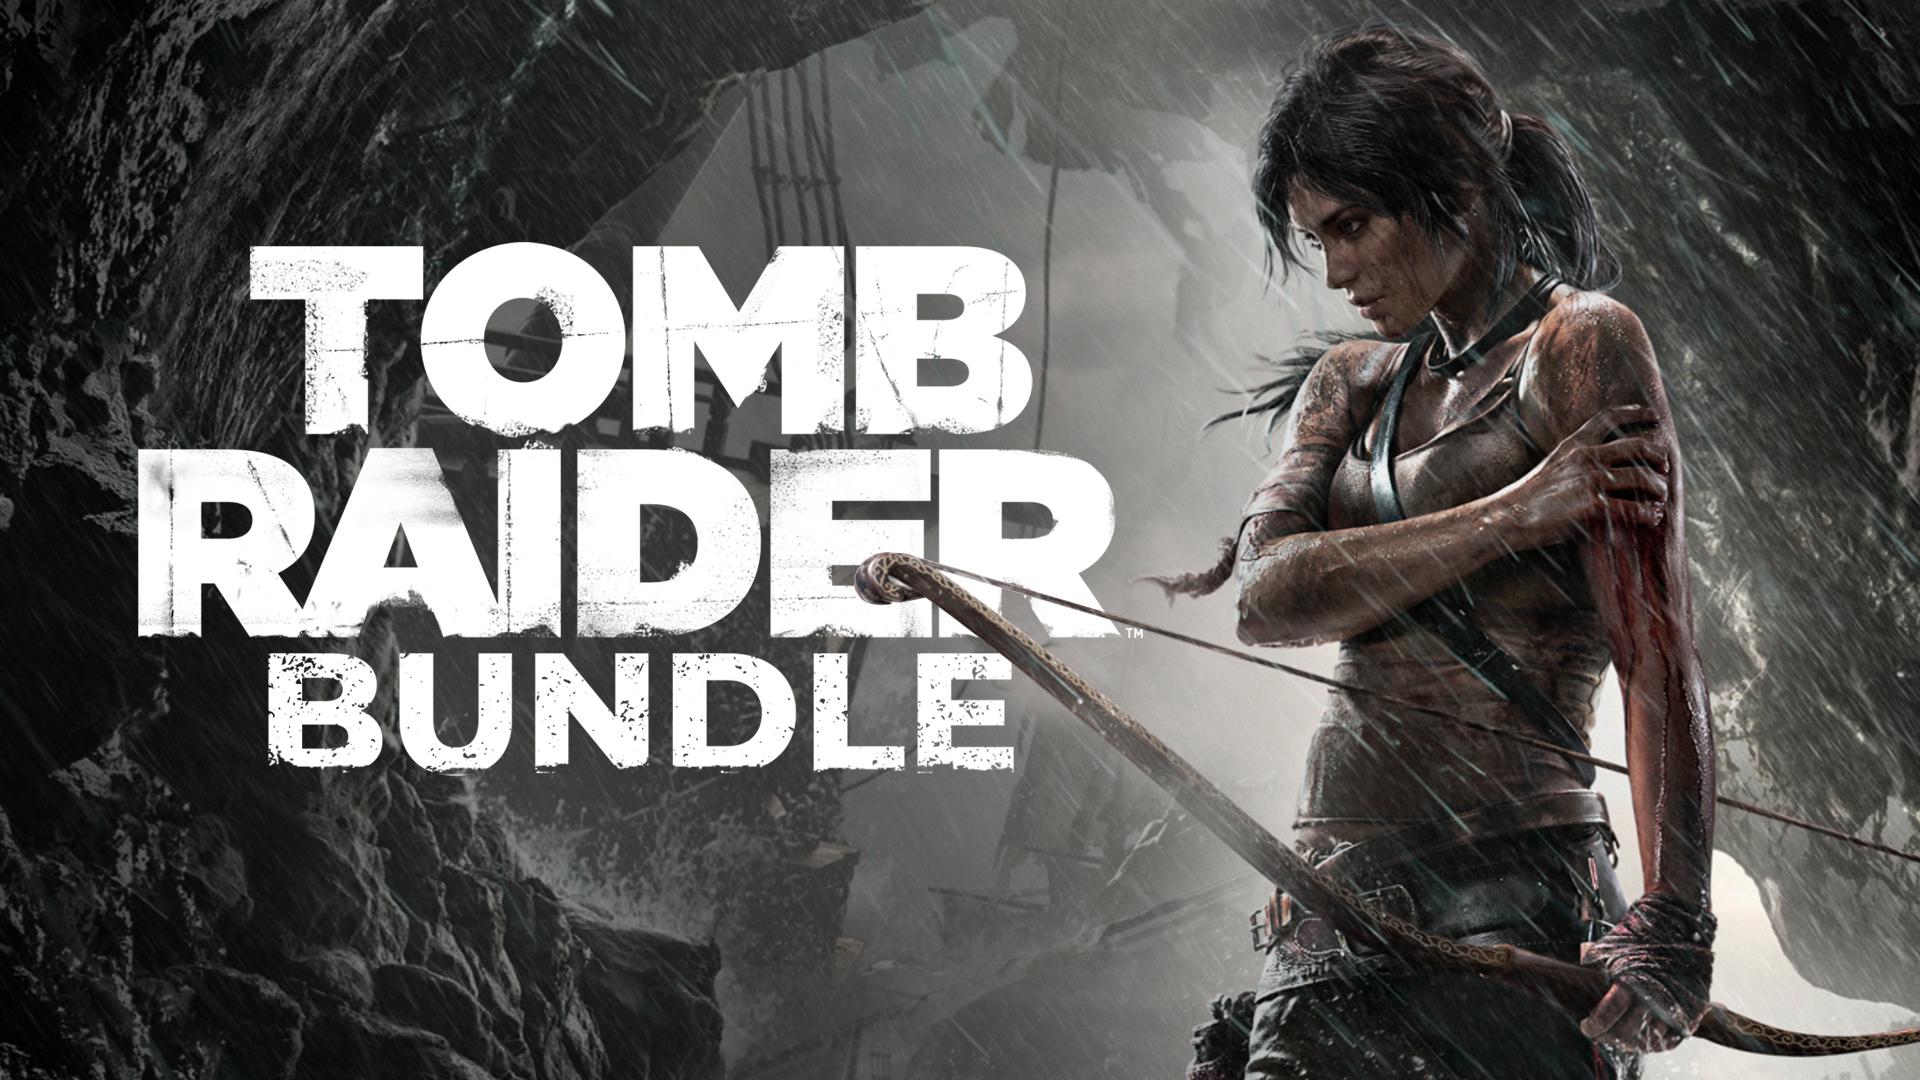 Tomb Raider Bundle Steam Game Bundle Fanatical